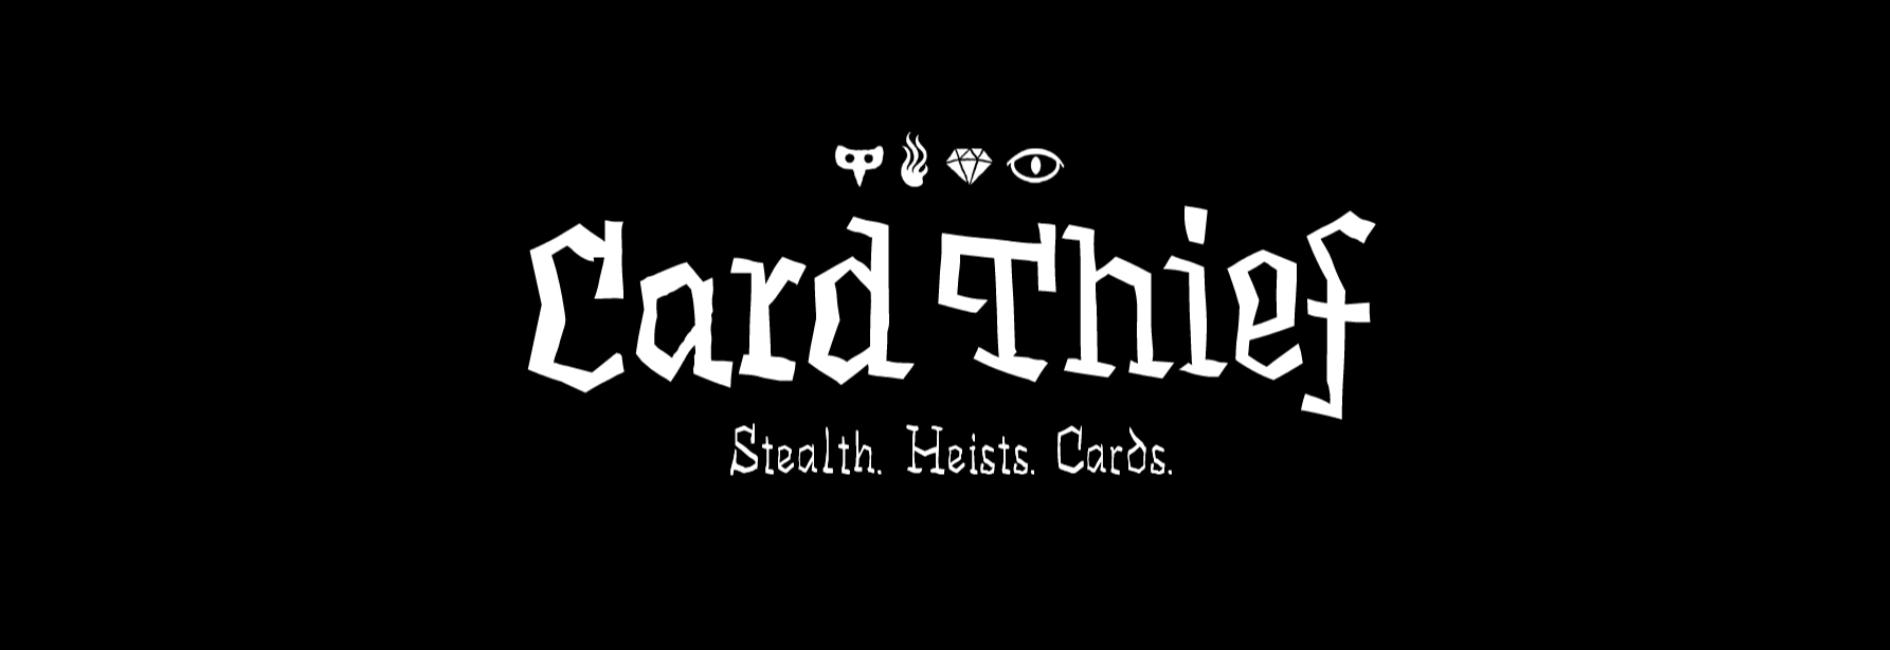 cardthief2